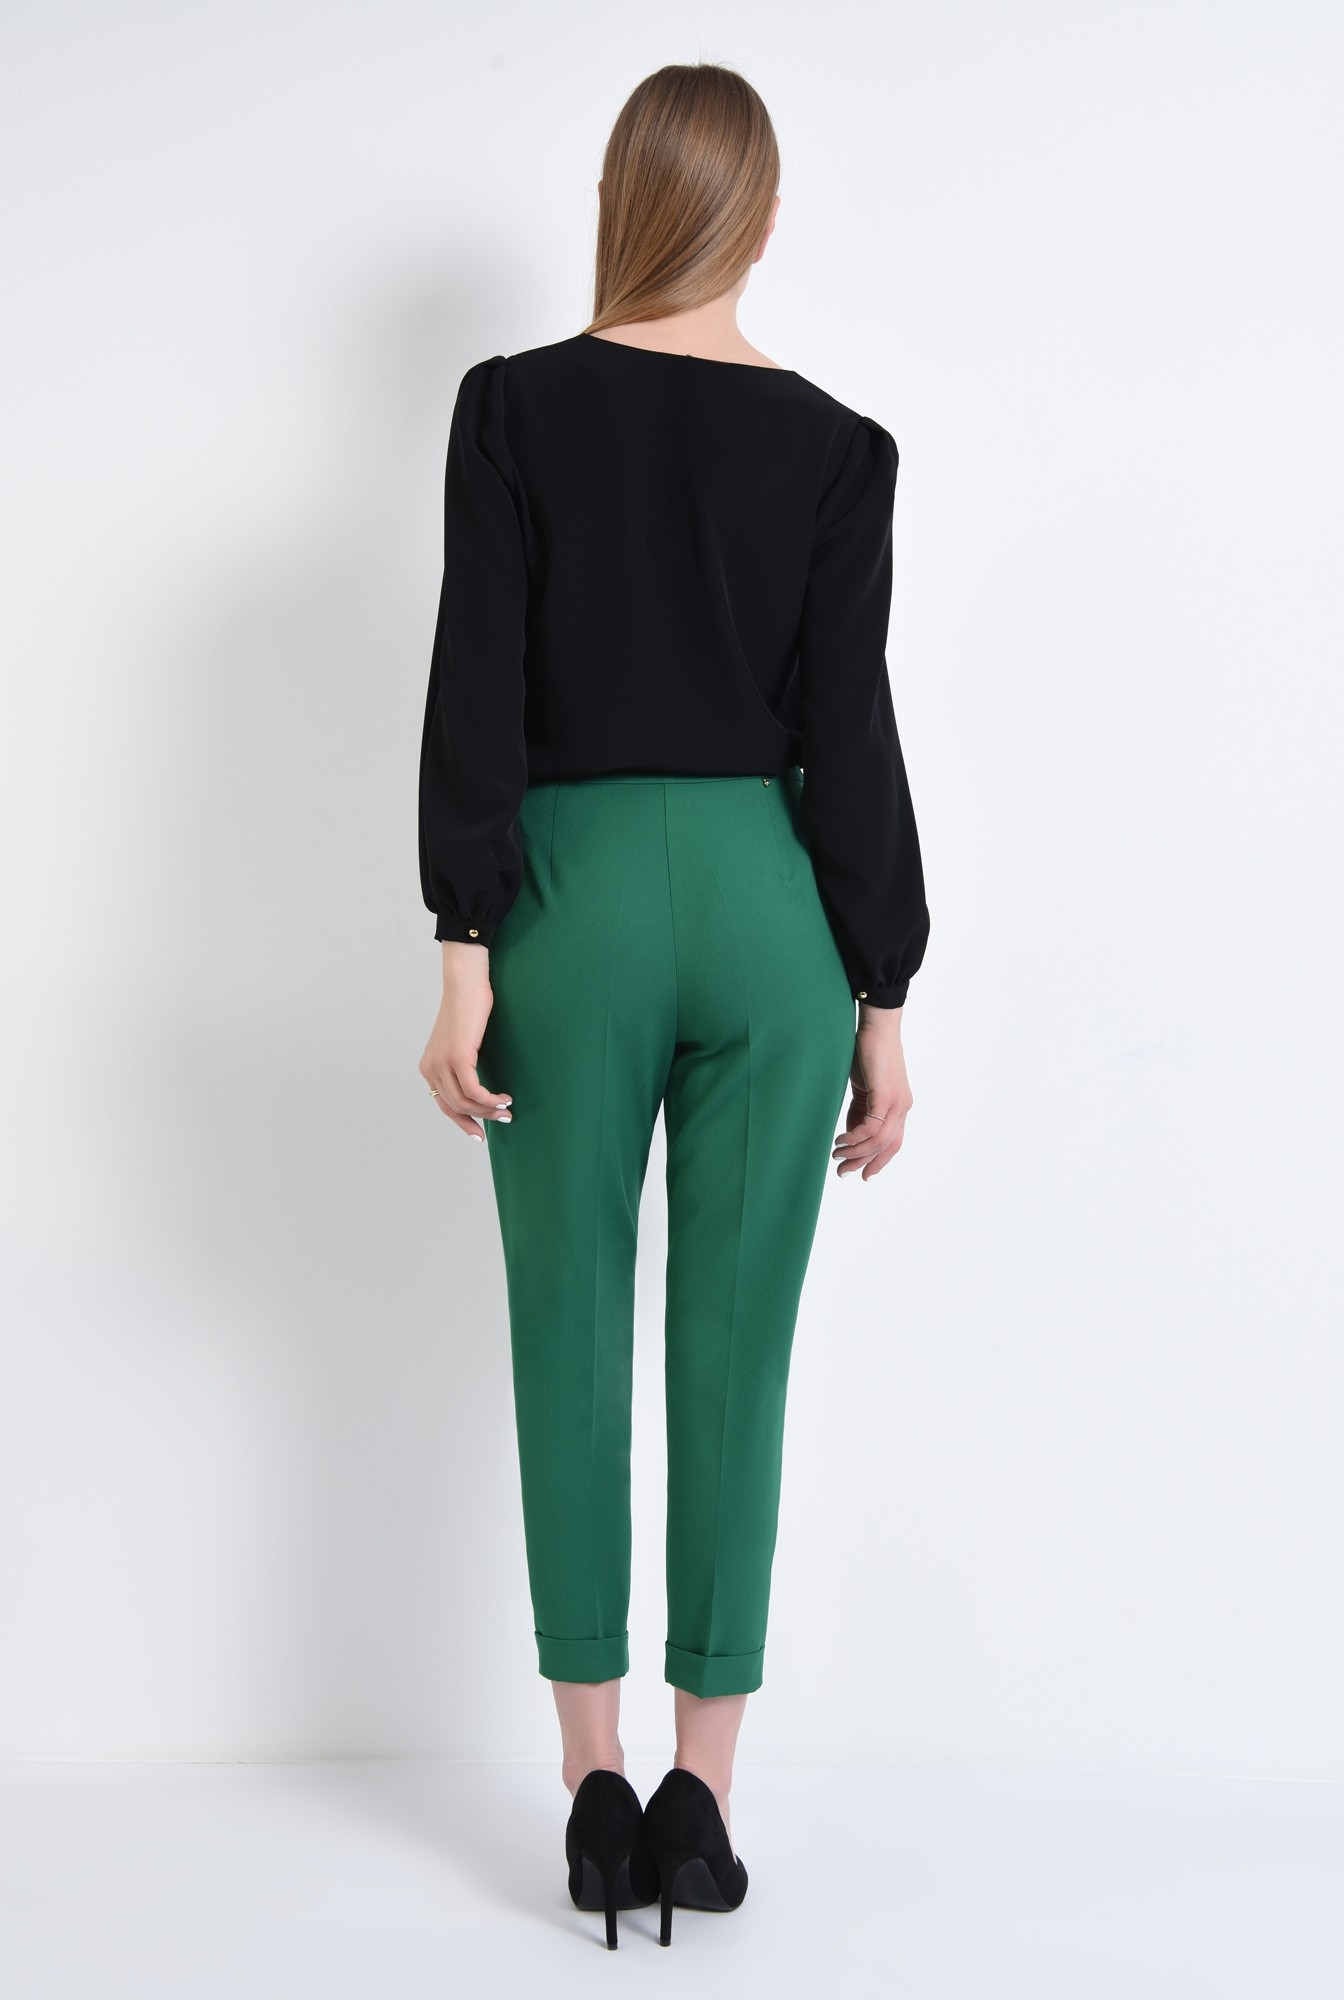 1 - Pantaloni casual, verde